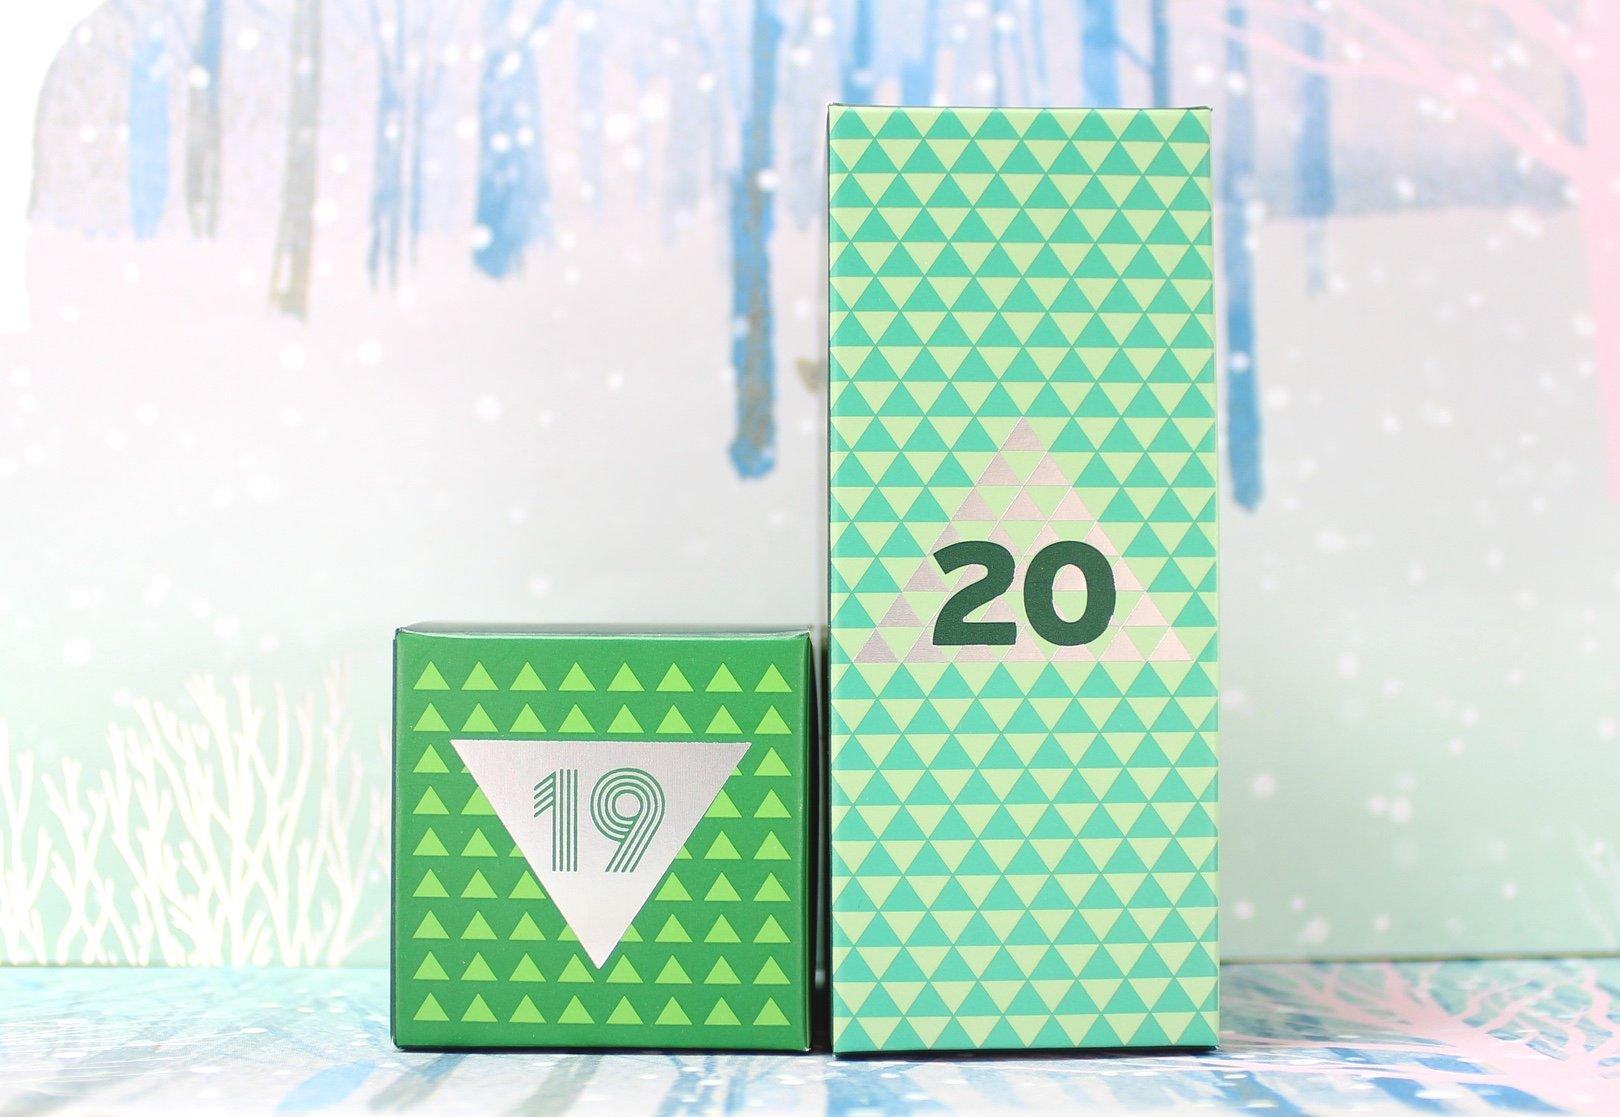 The Body Shop Deluxe Advent Calendar: Days 19 20